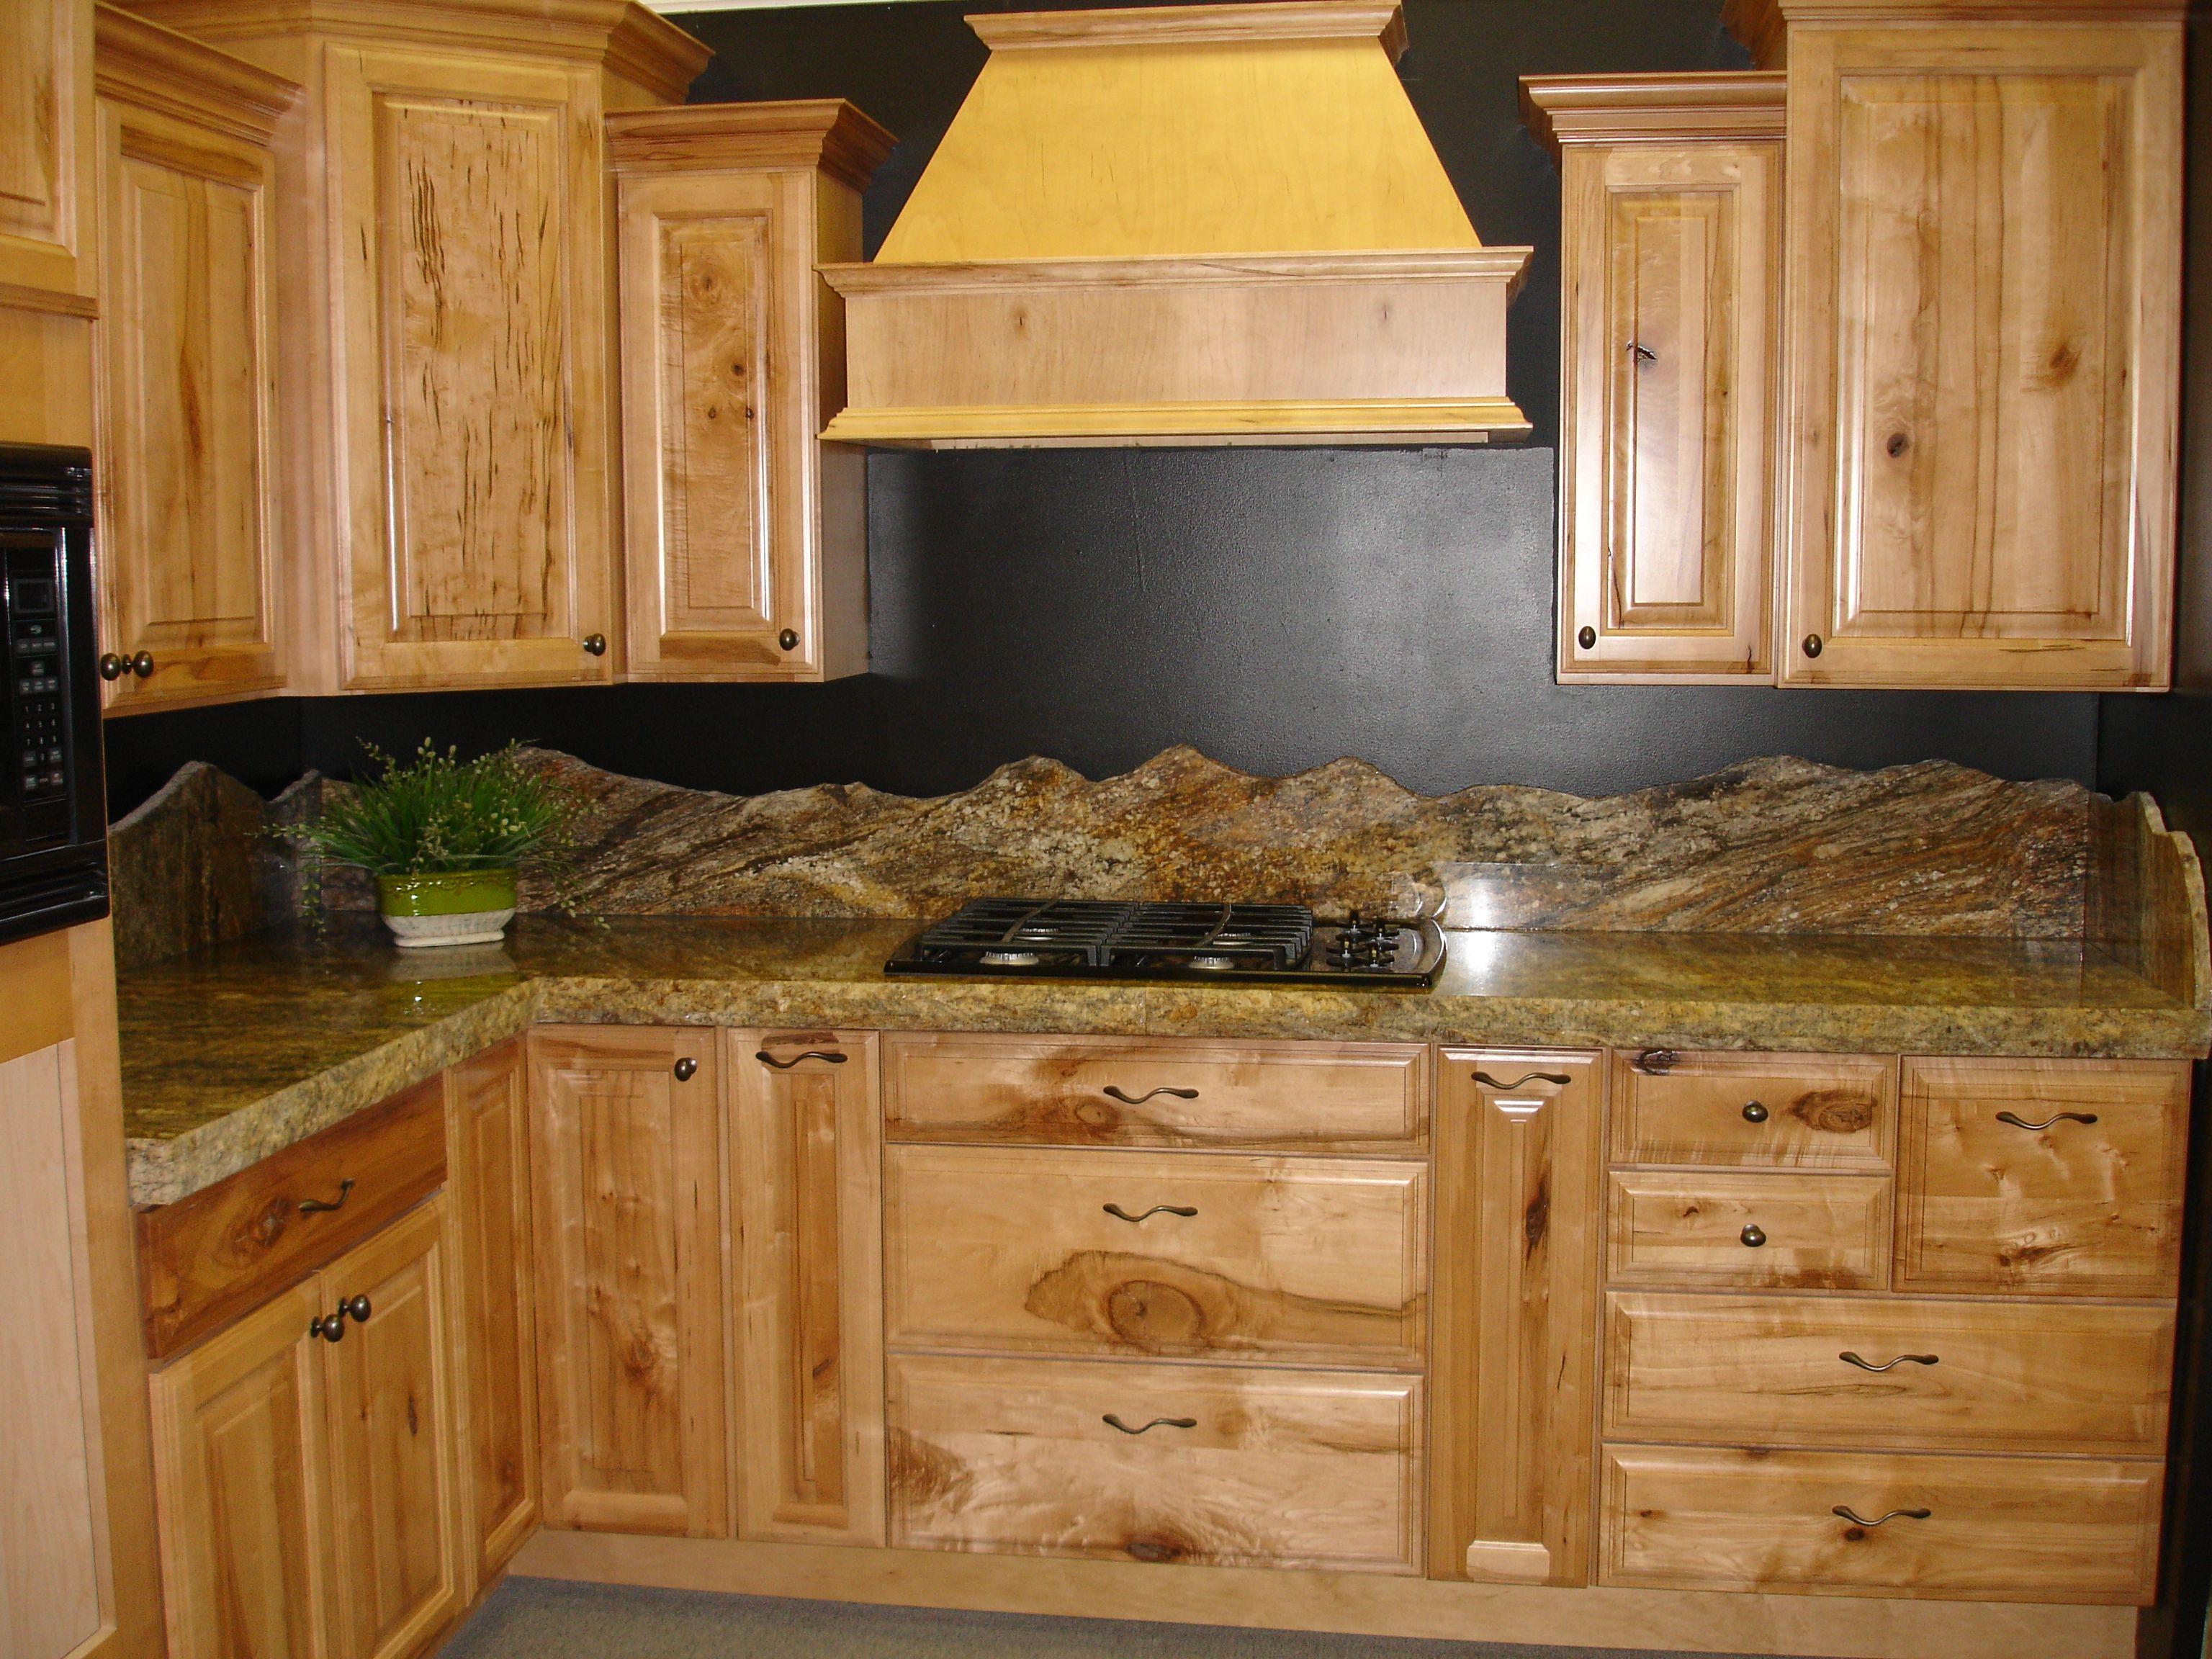 Backsplash Mountain Silhouette Granite Counter Tops And